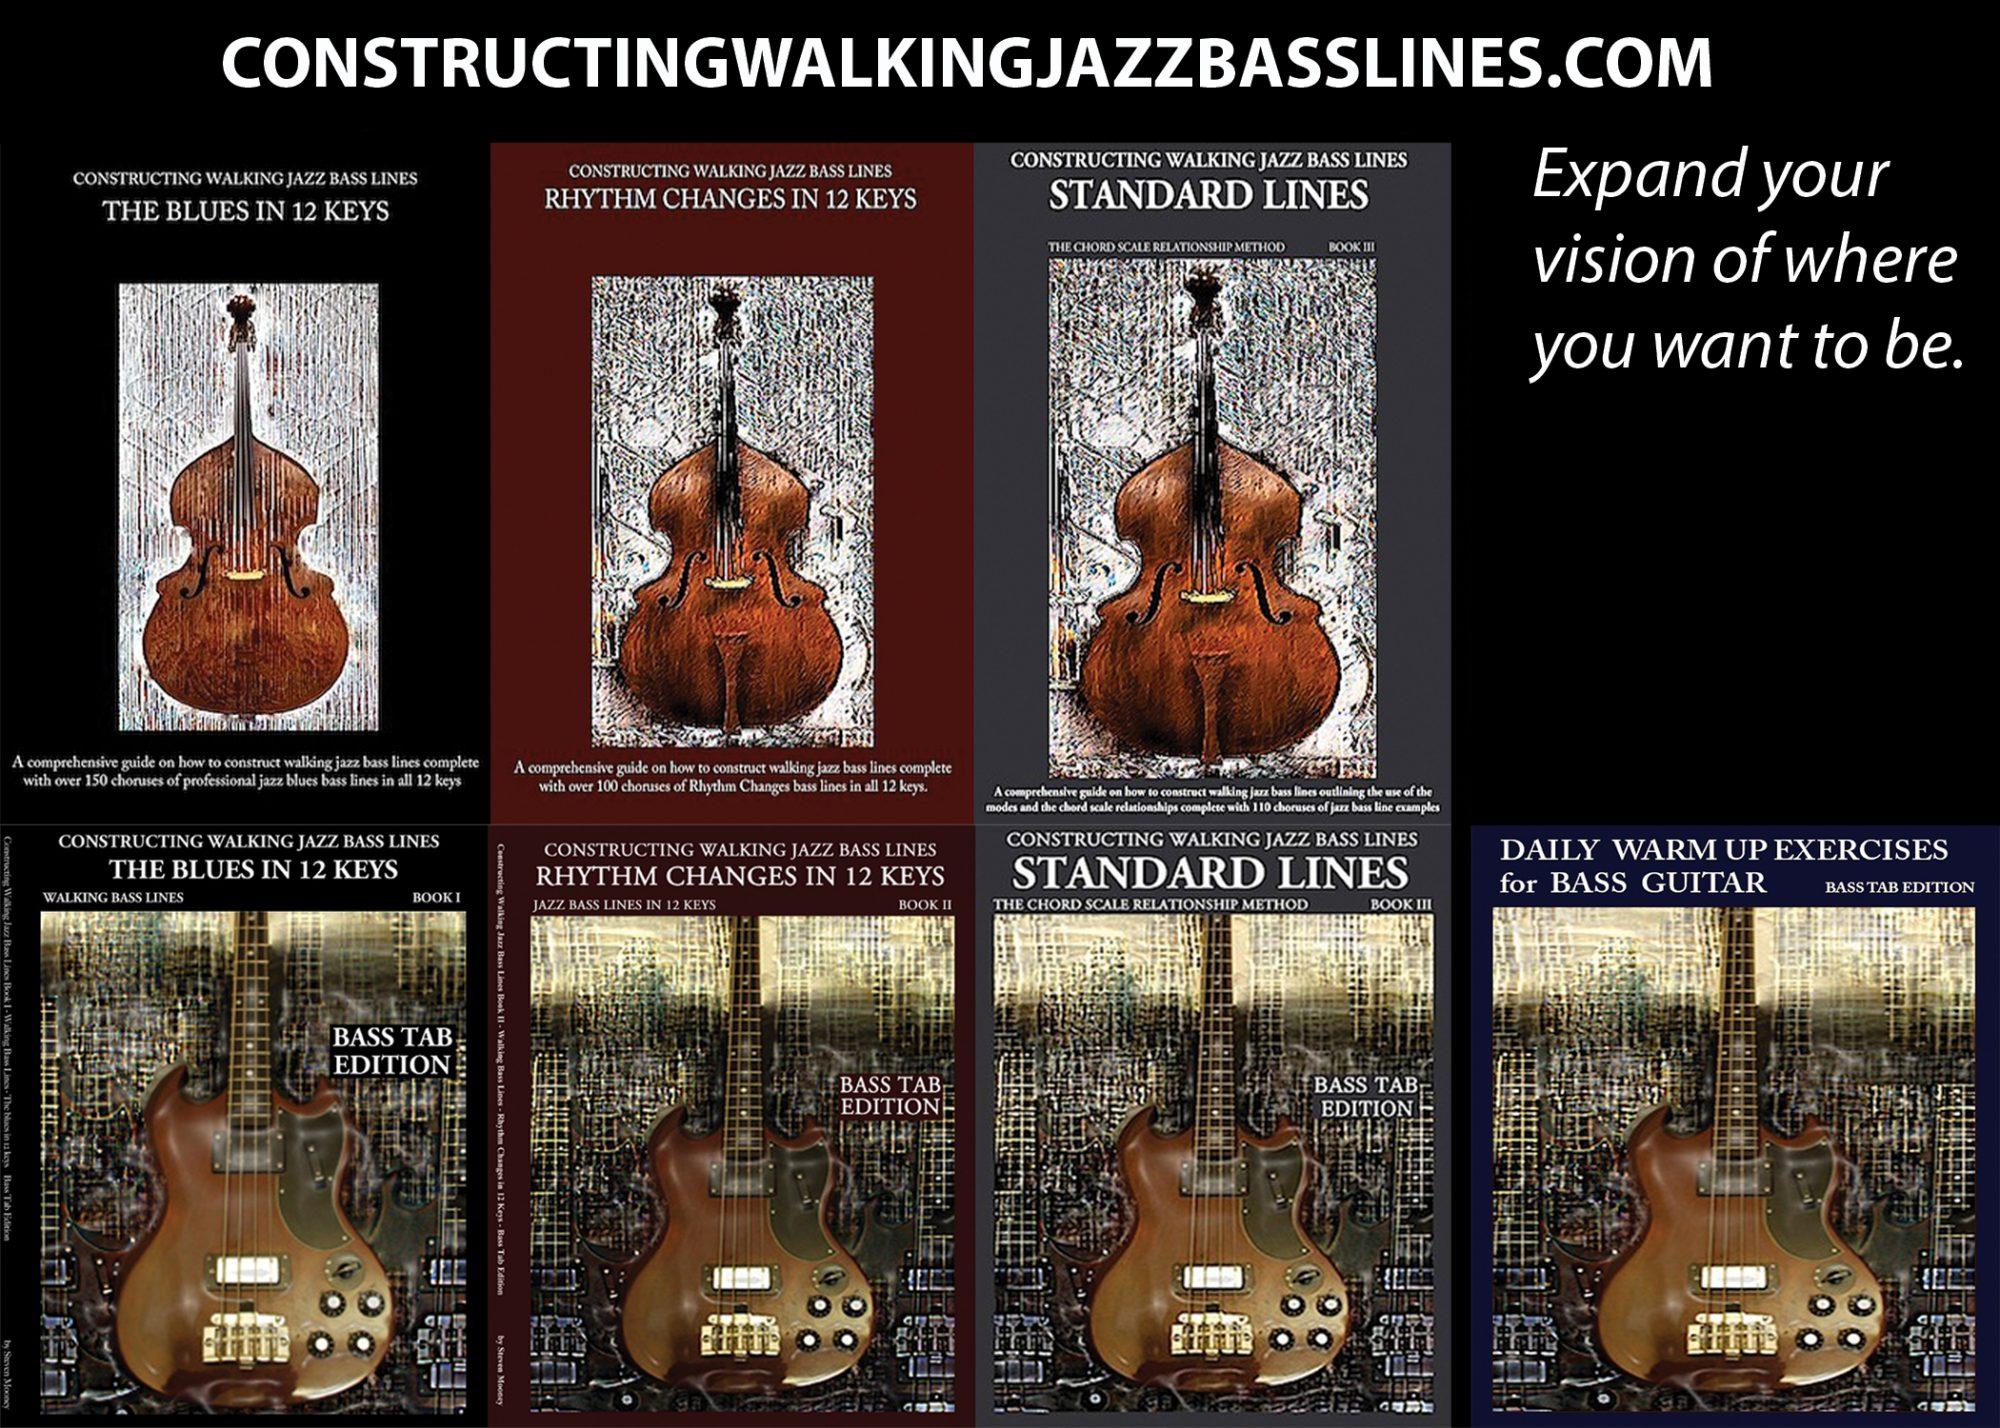 Construcing Walking Jazz Bass Lines Blog